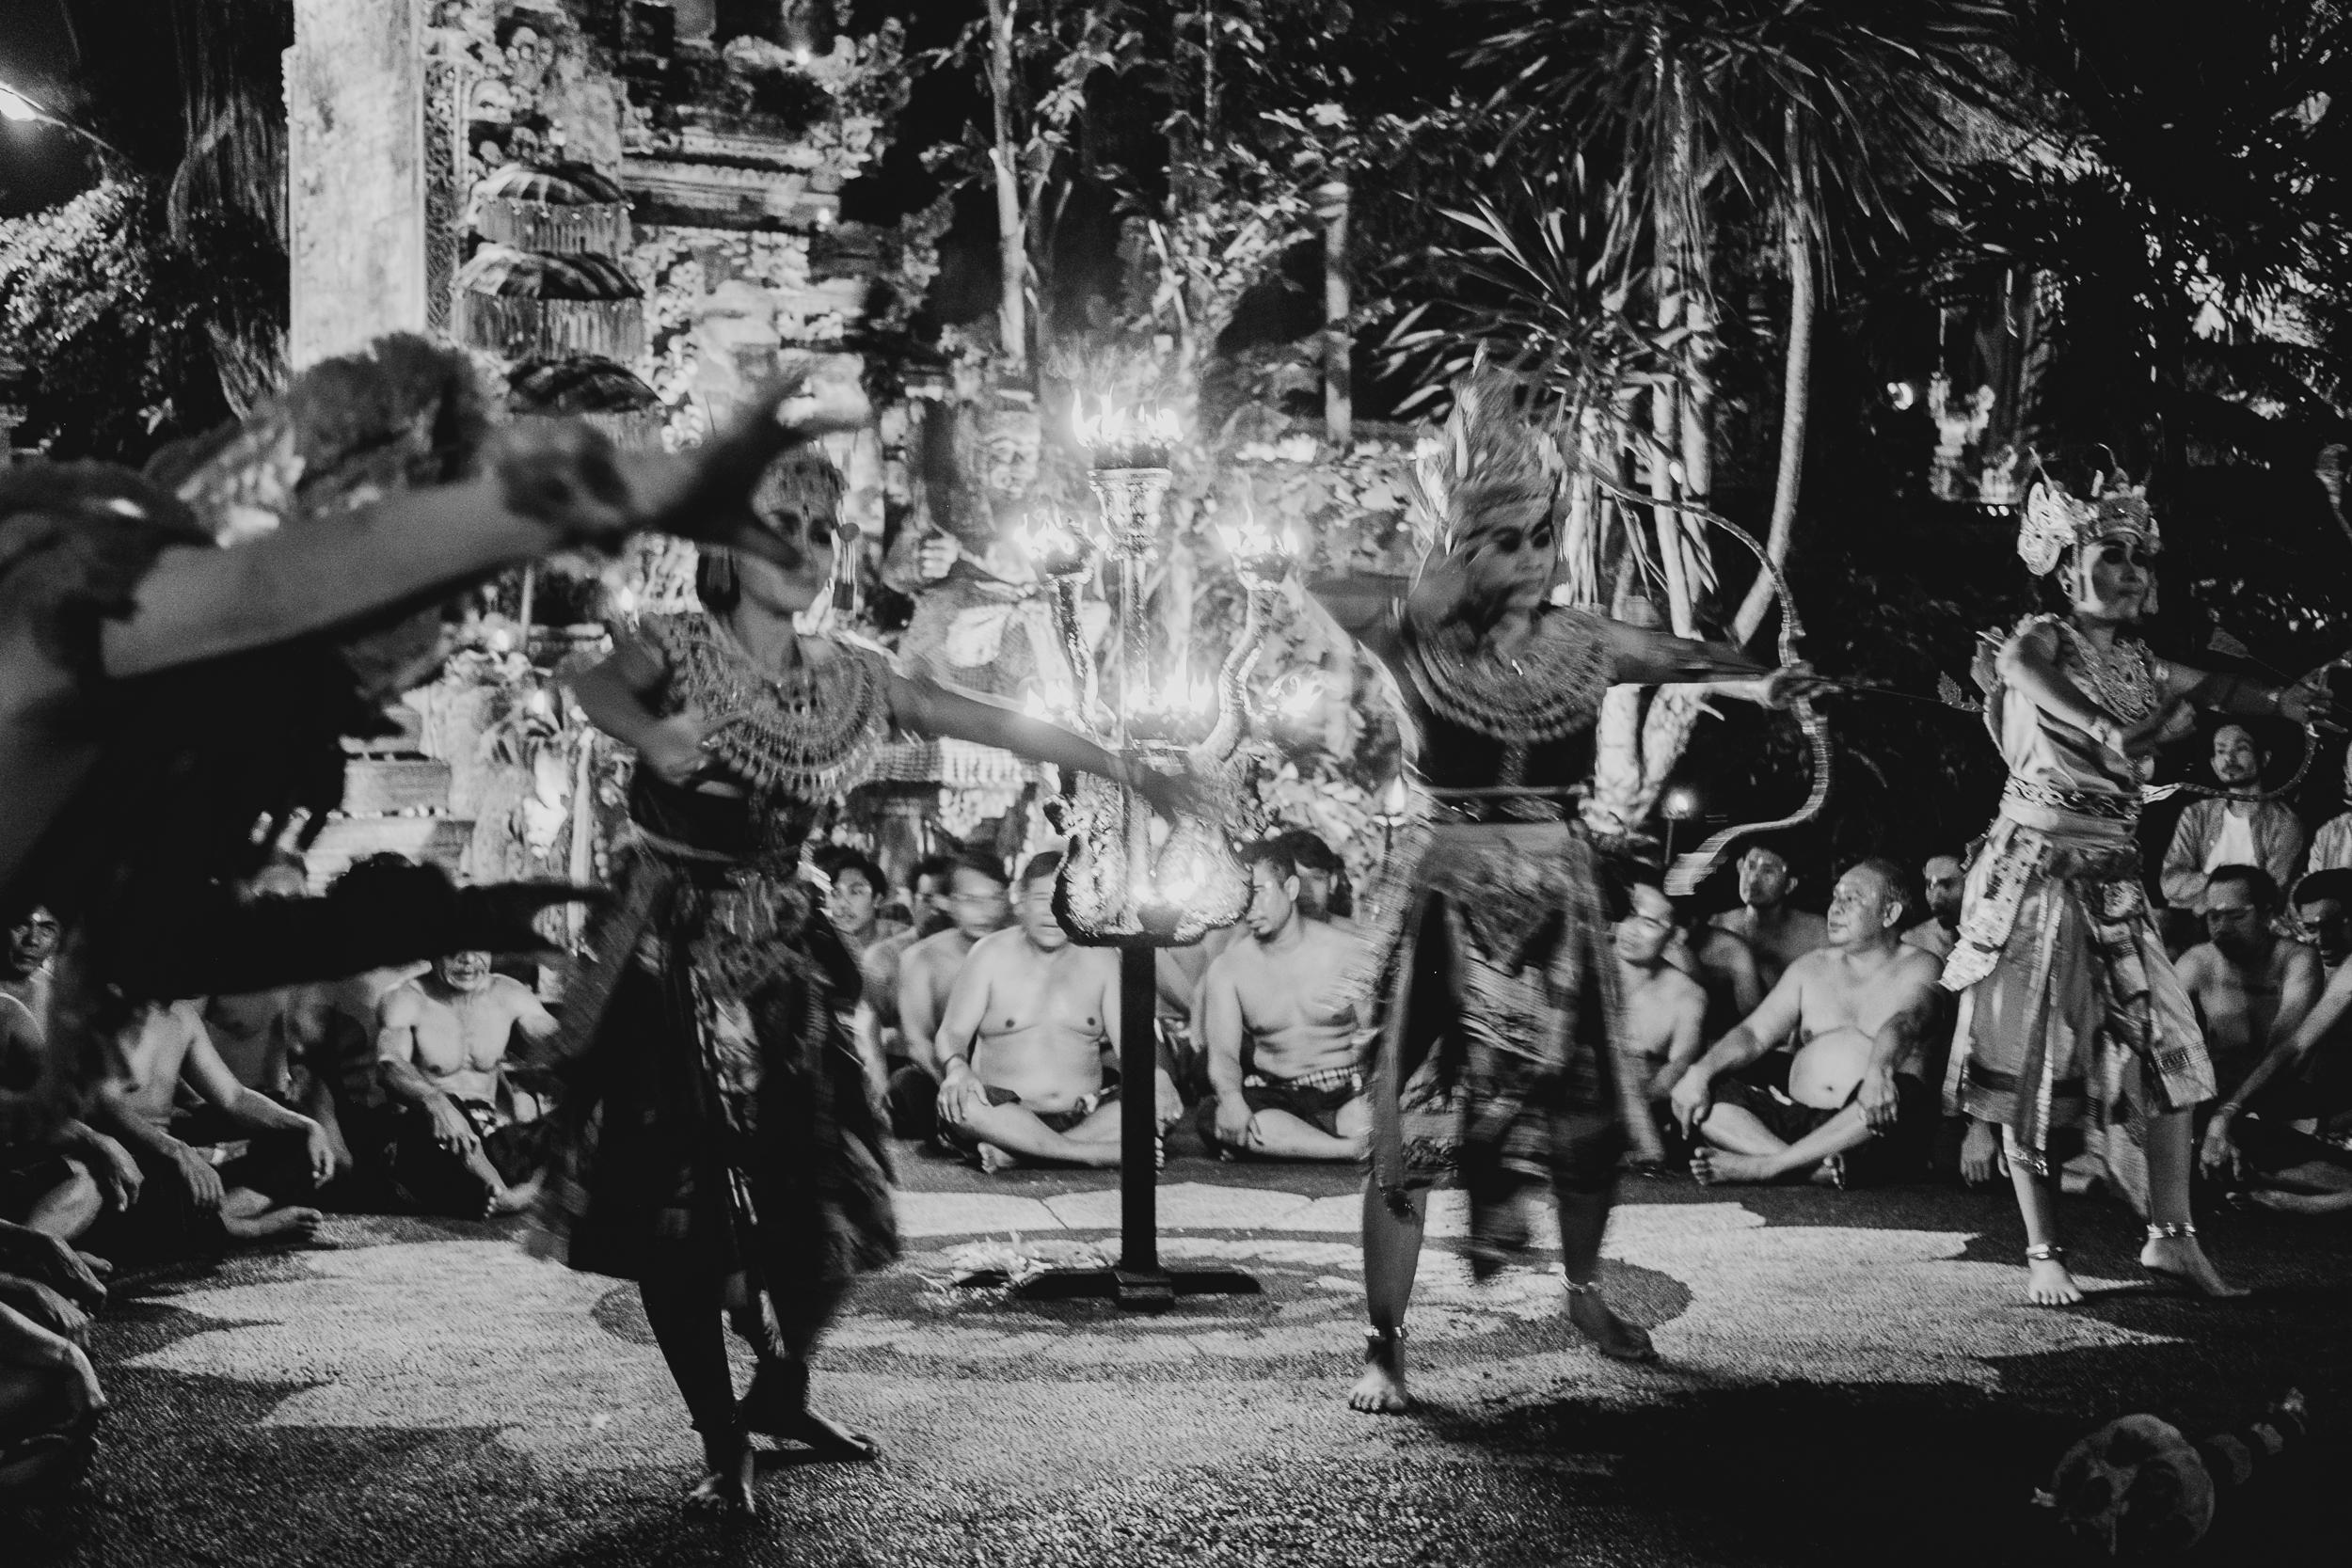 Kecak Fire Dance, Bali, Indonesia, 2018.